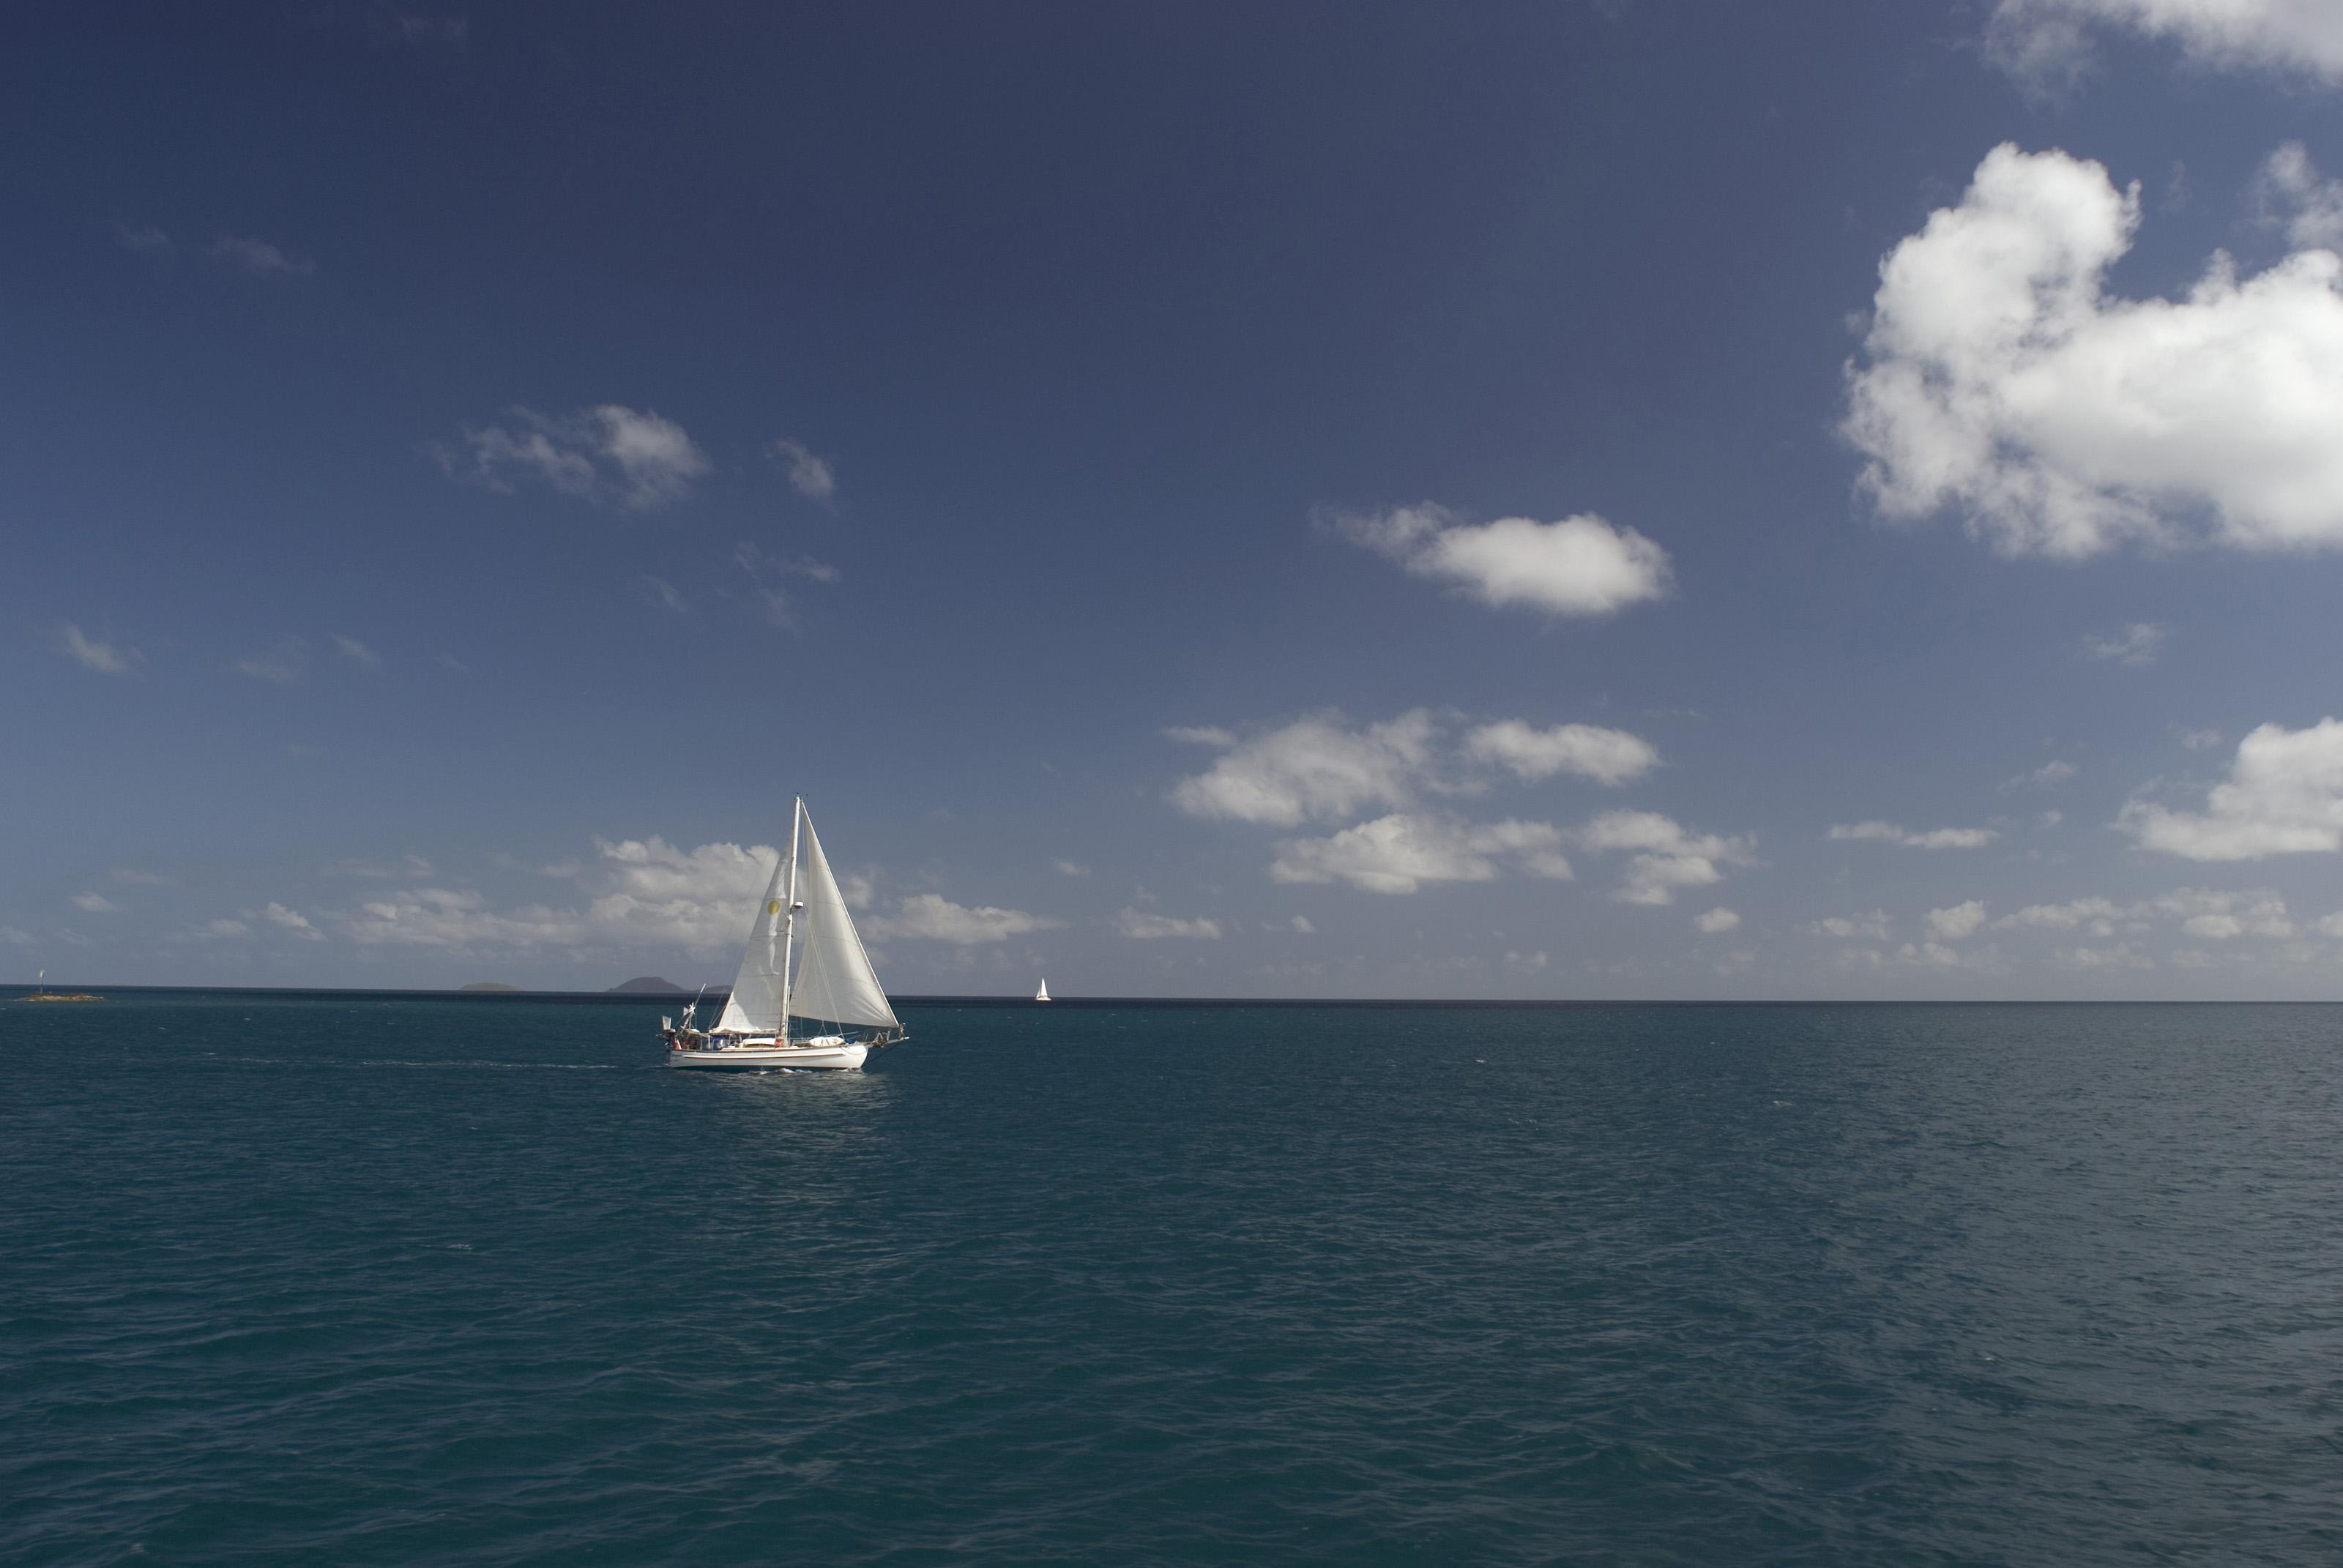 Pleasure Yacht At Sea-3824   Stockarch Free Stock Photos